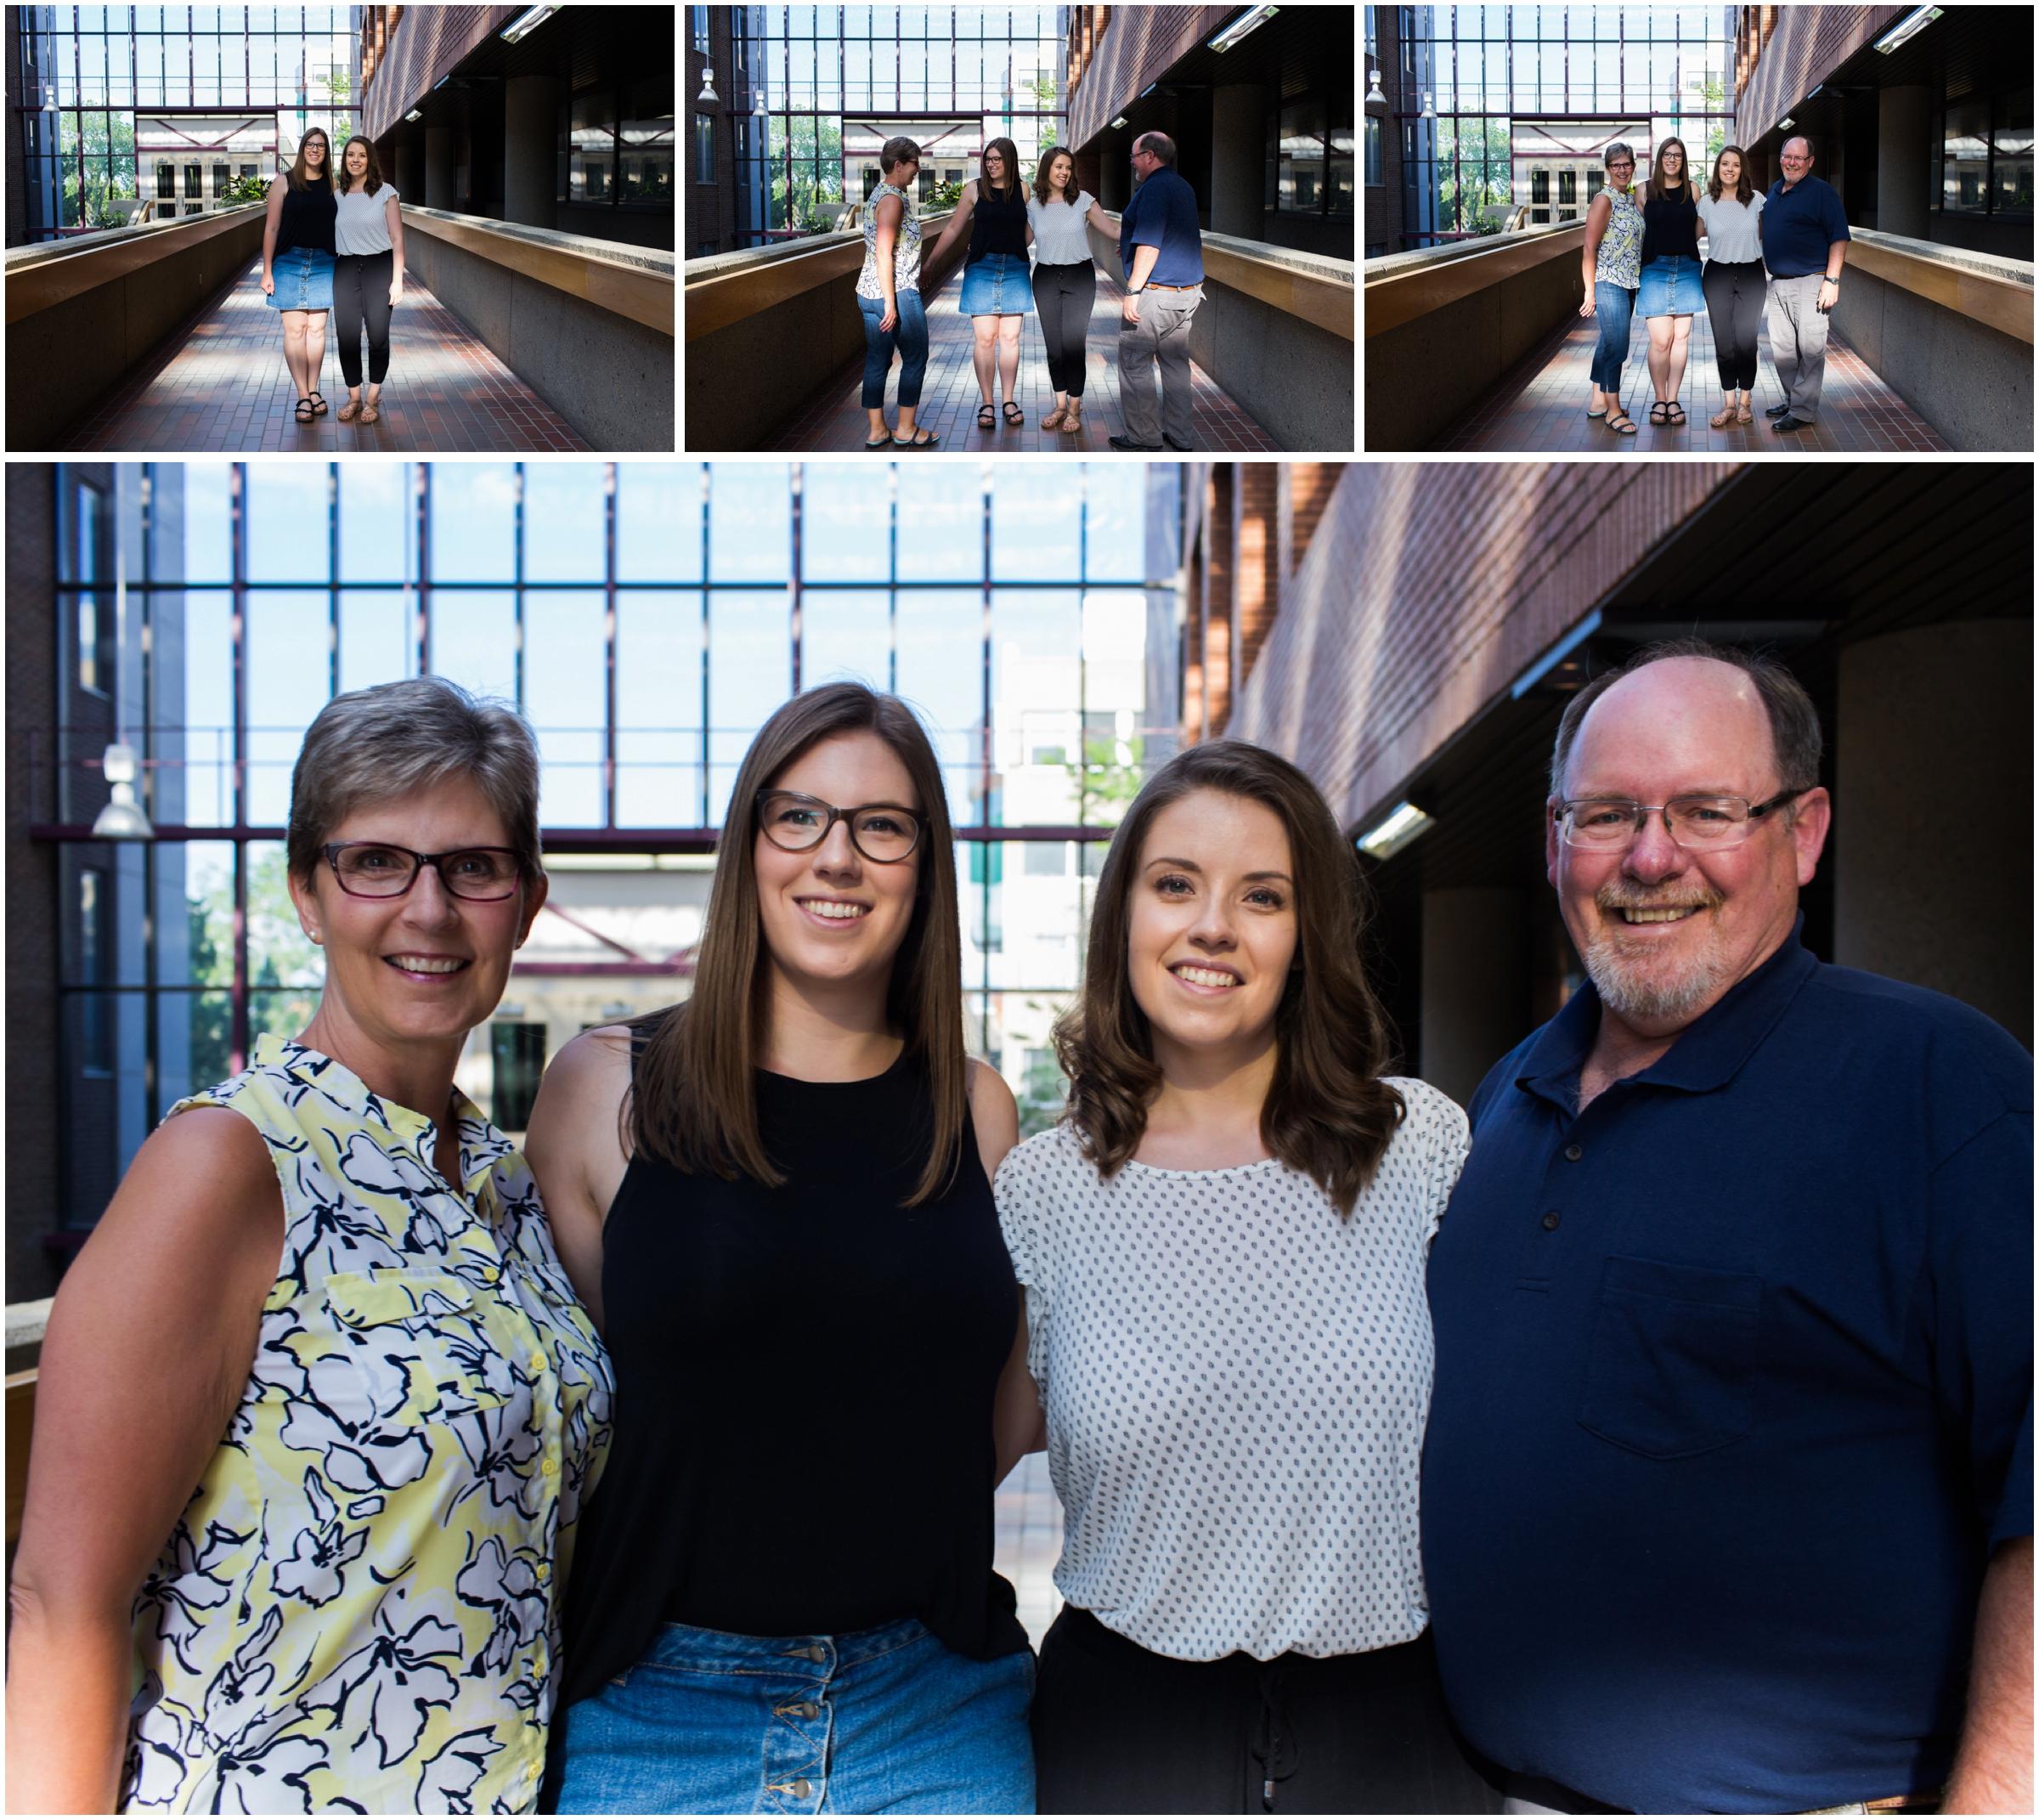 Edmonton Family Photo Session - (Selena Phillips-Boyle)_0015.jpg